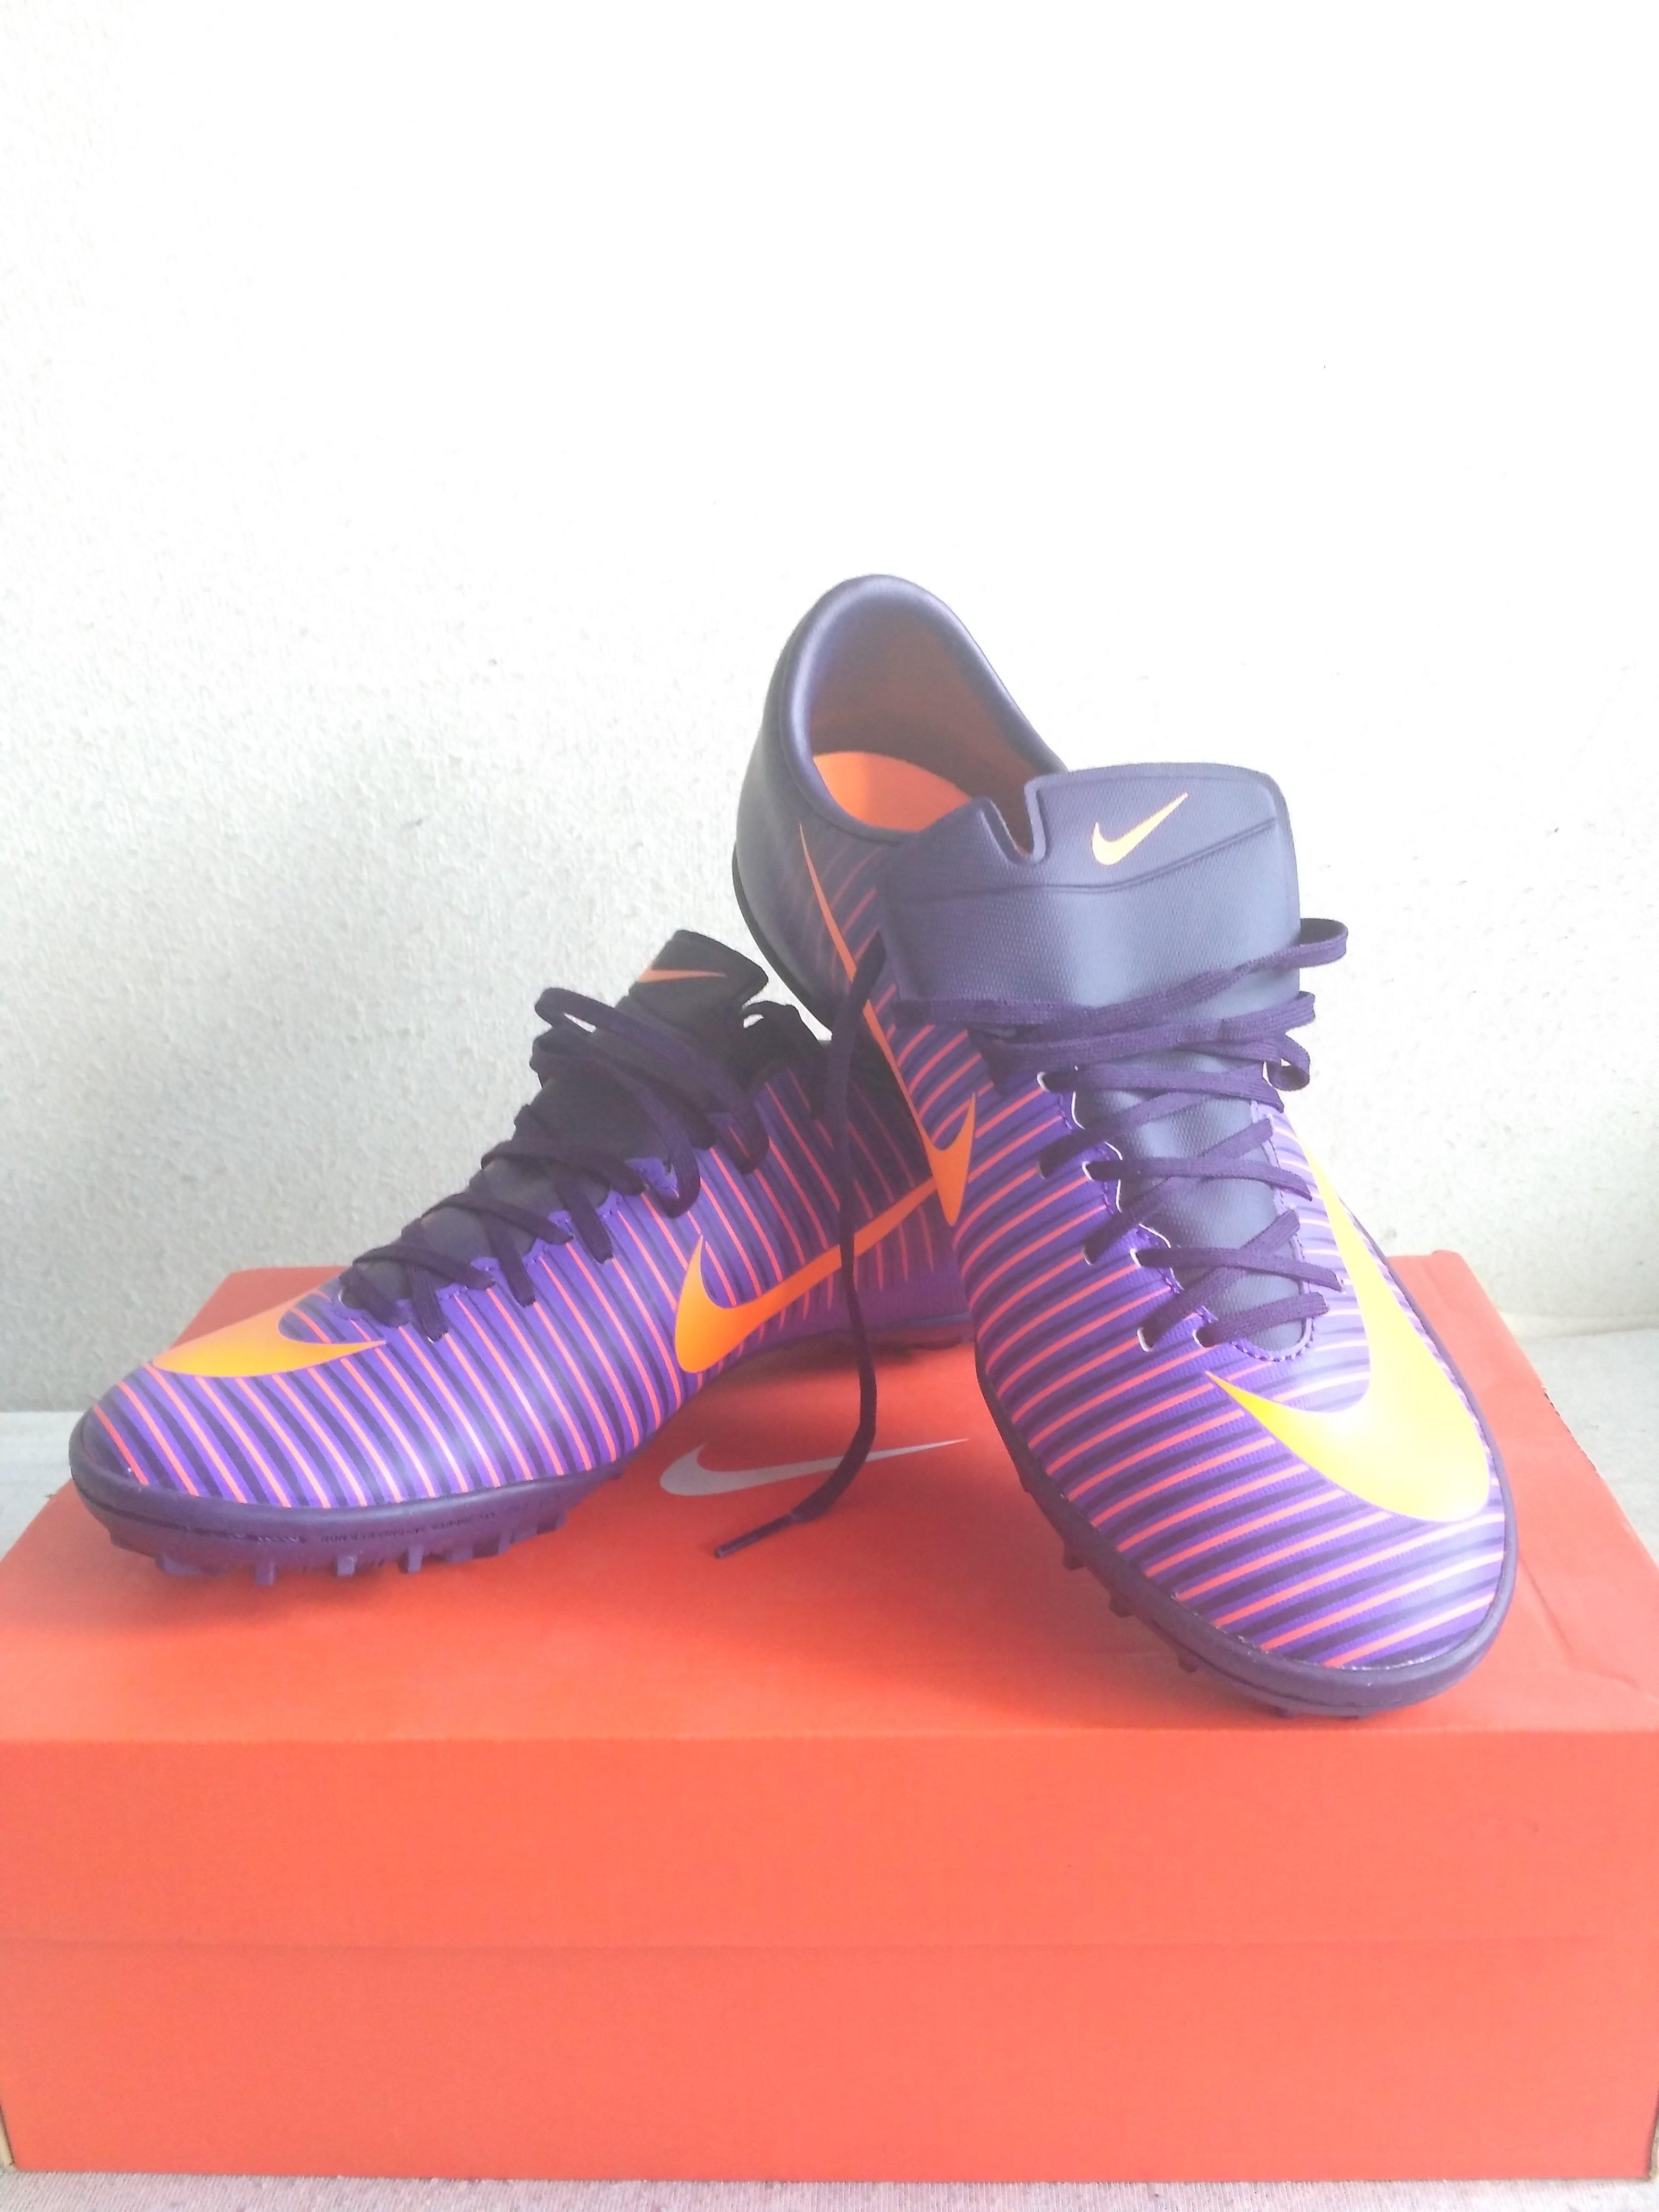 Adidasi Nike Mercurial Victory VI Astro Turf